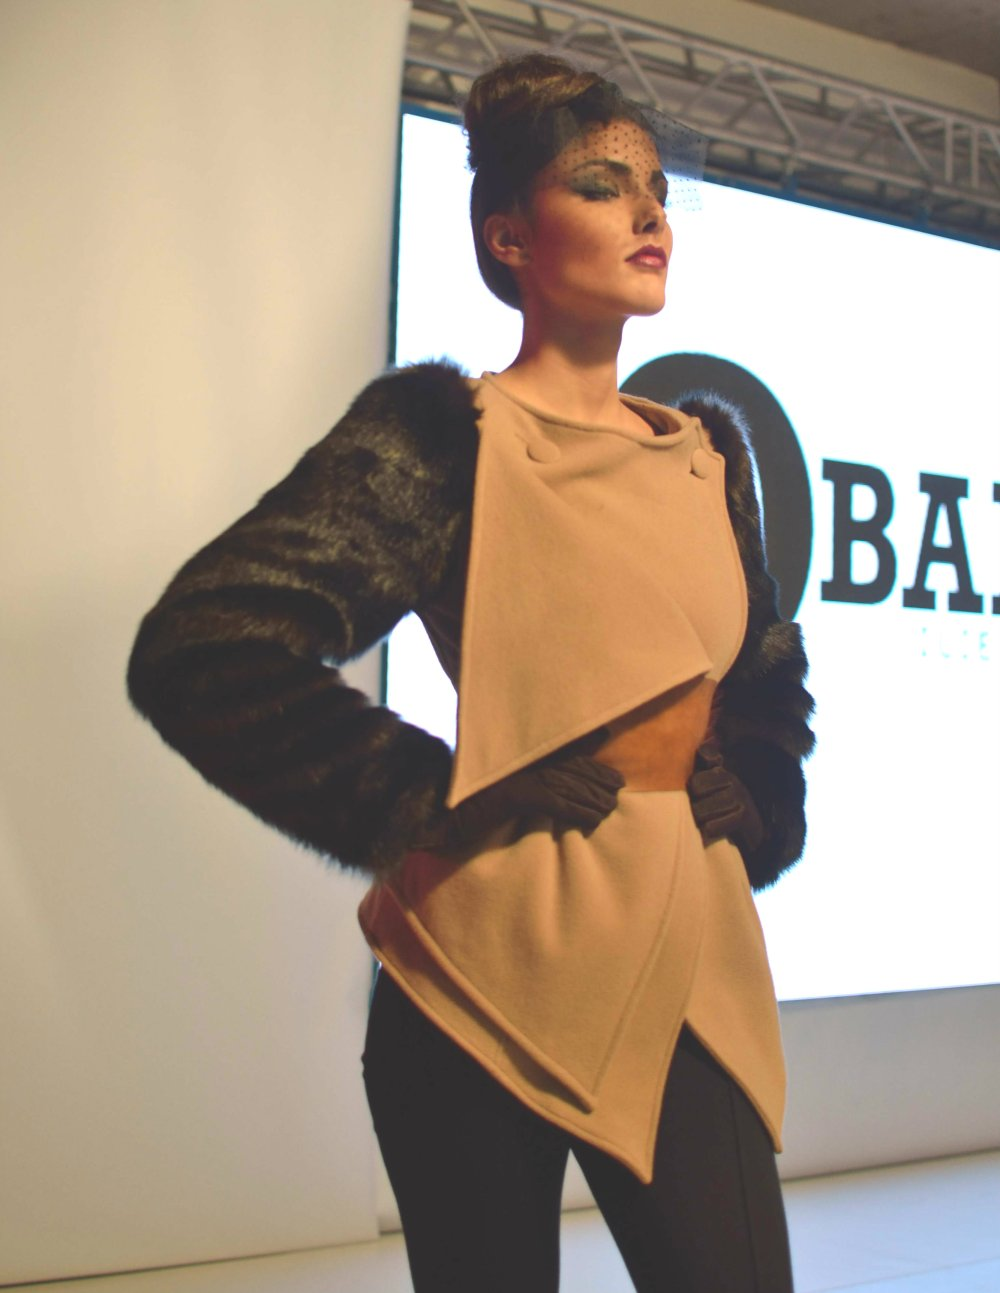 Model Ana Stanojkovska truly captured THE look